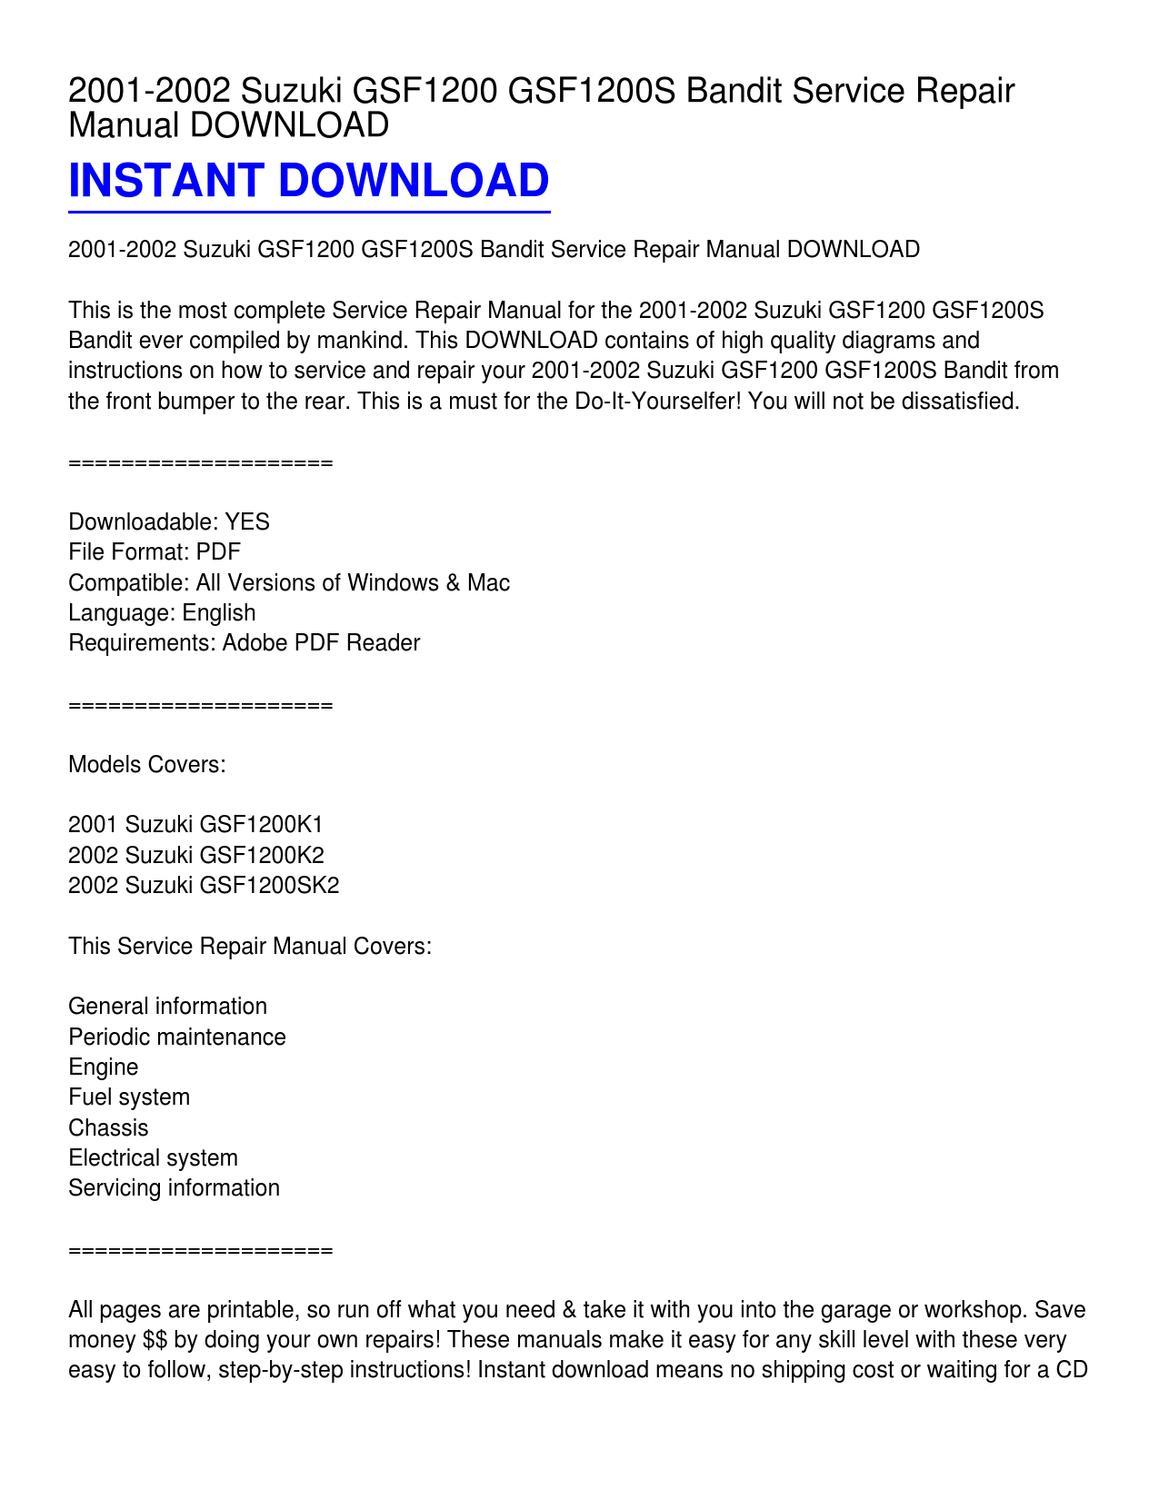 2001-2002 Suzuki GSF1200 GSF1200S Bandit Service Repair Manual DOWNLOAD by  Elizabeth Edwards - issuu